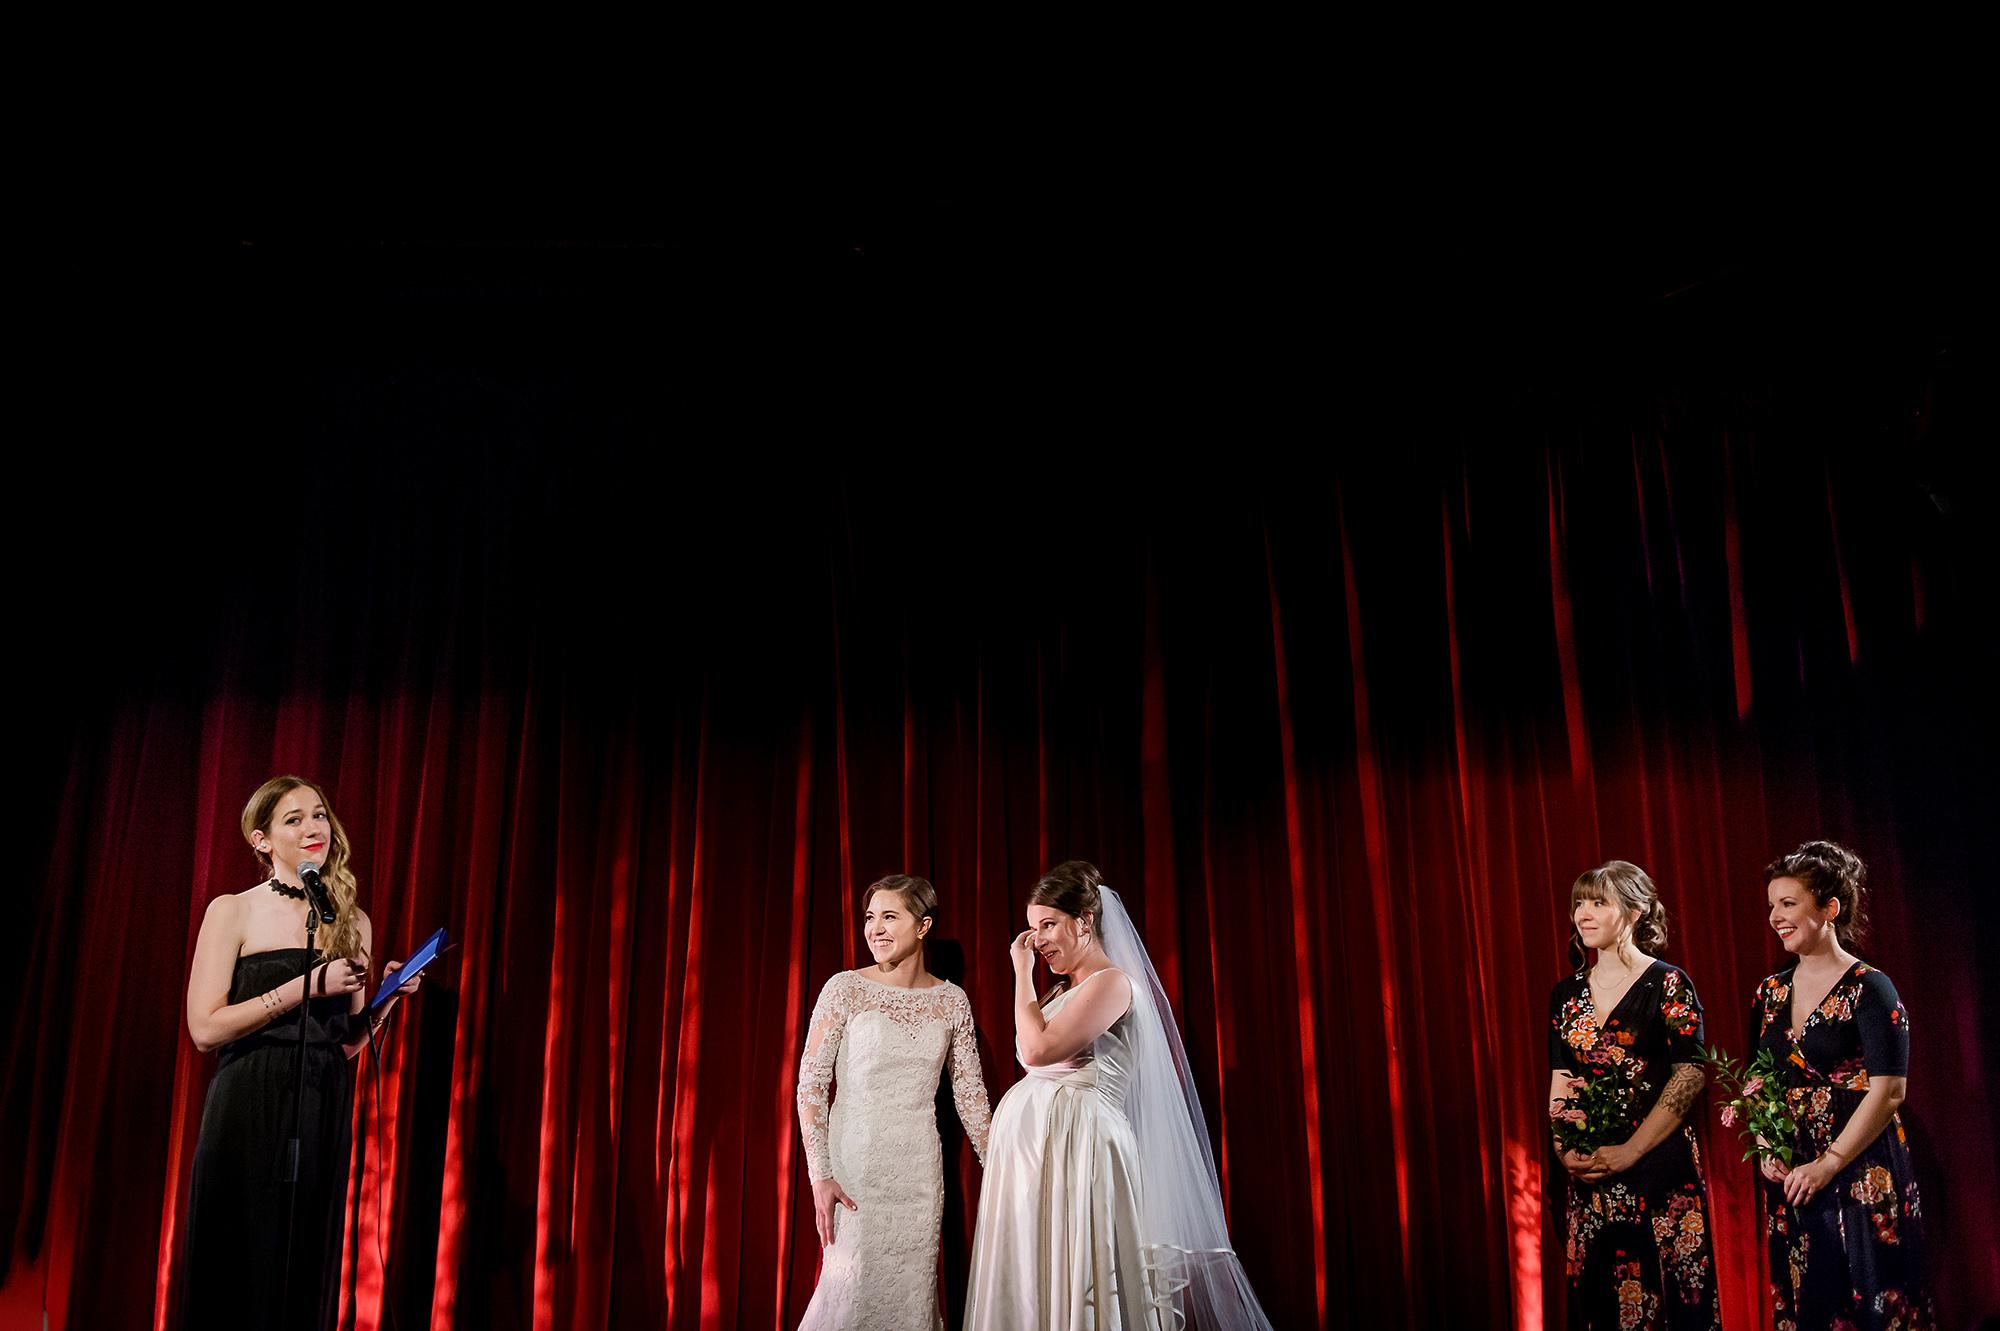 Pregnant bride cries during toast - Davina + Daniel